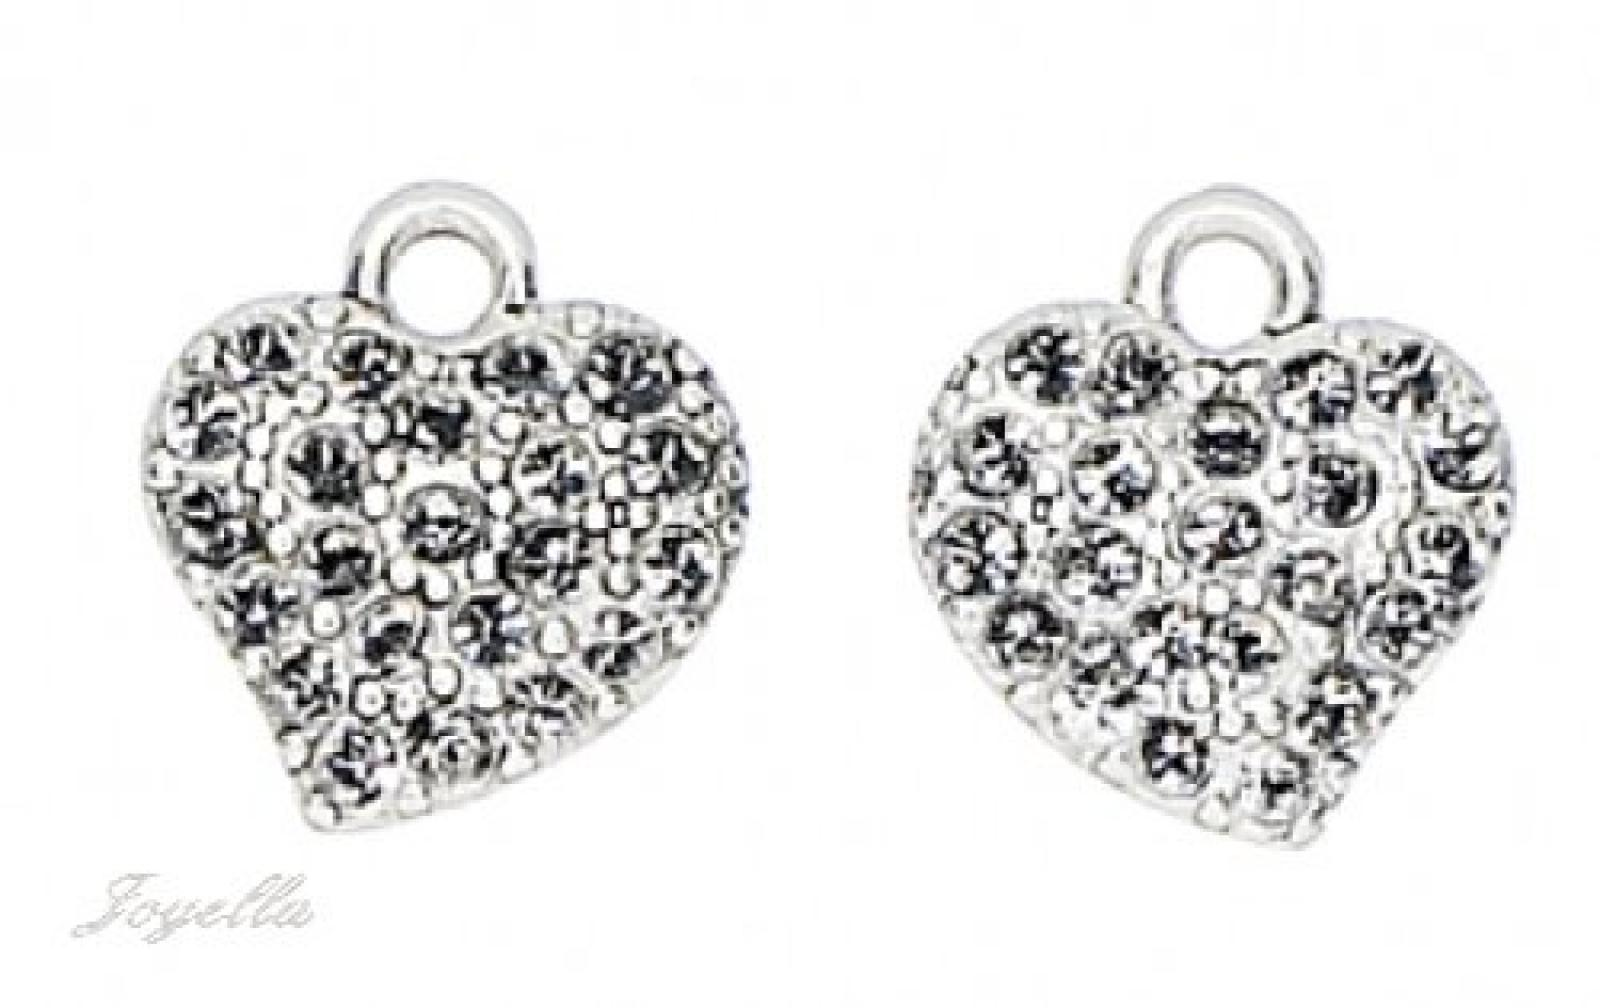 PILGRIM 511-001 Ohrring-Charms Anhänger, versilbert, kristall